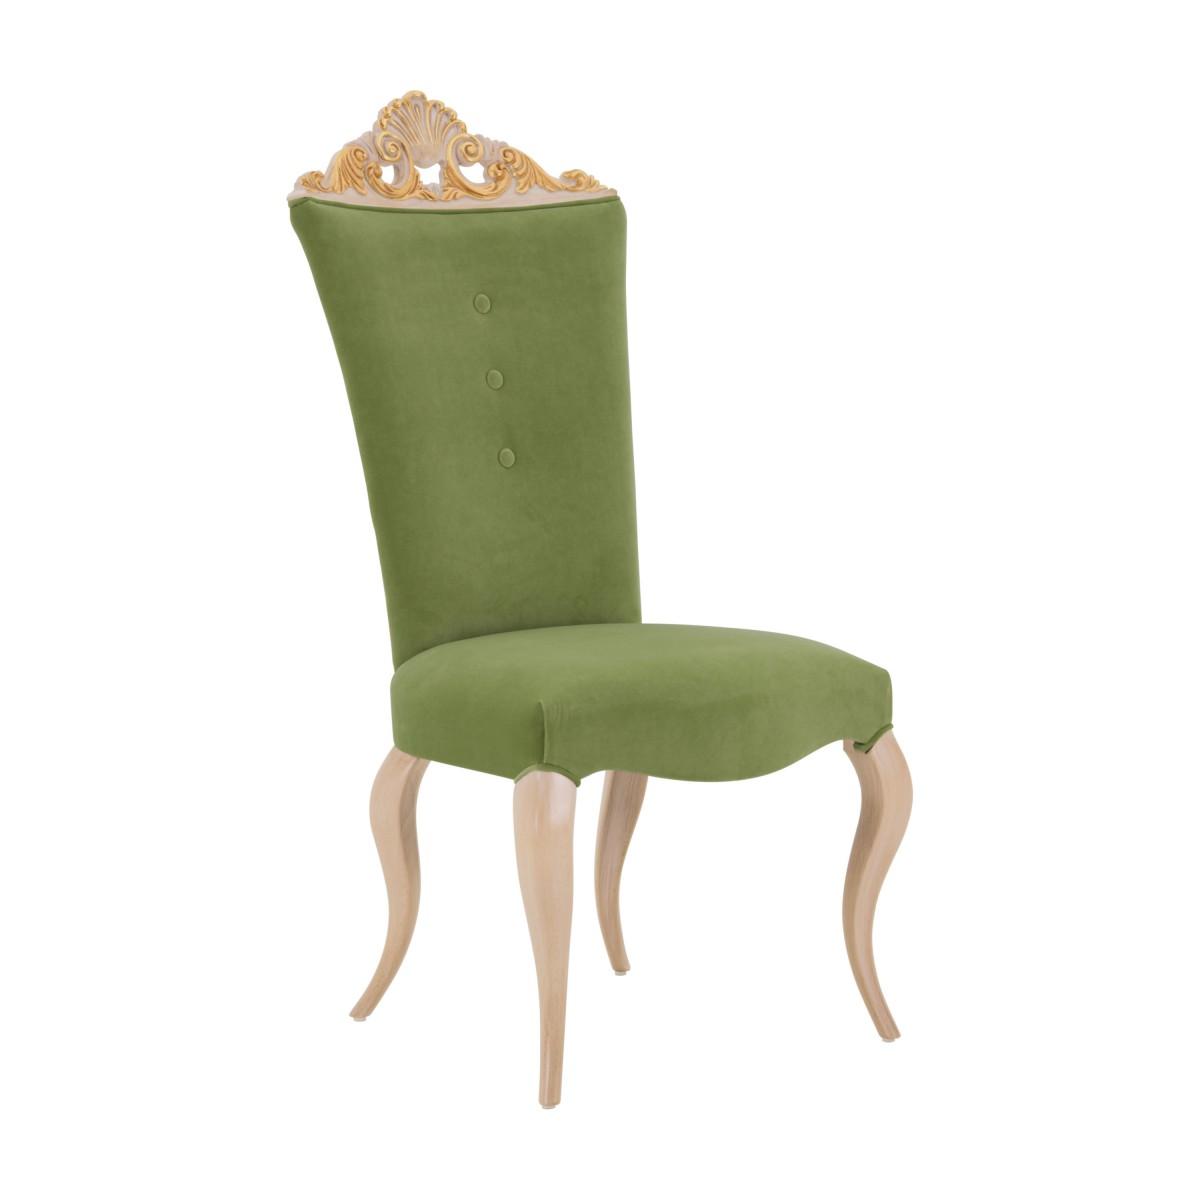 replica chair antesia 8467